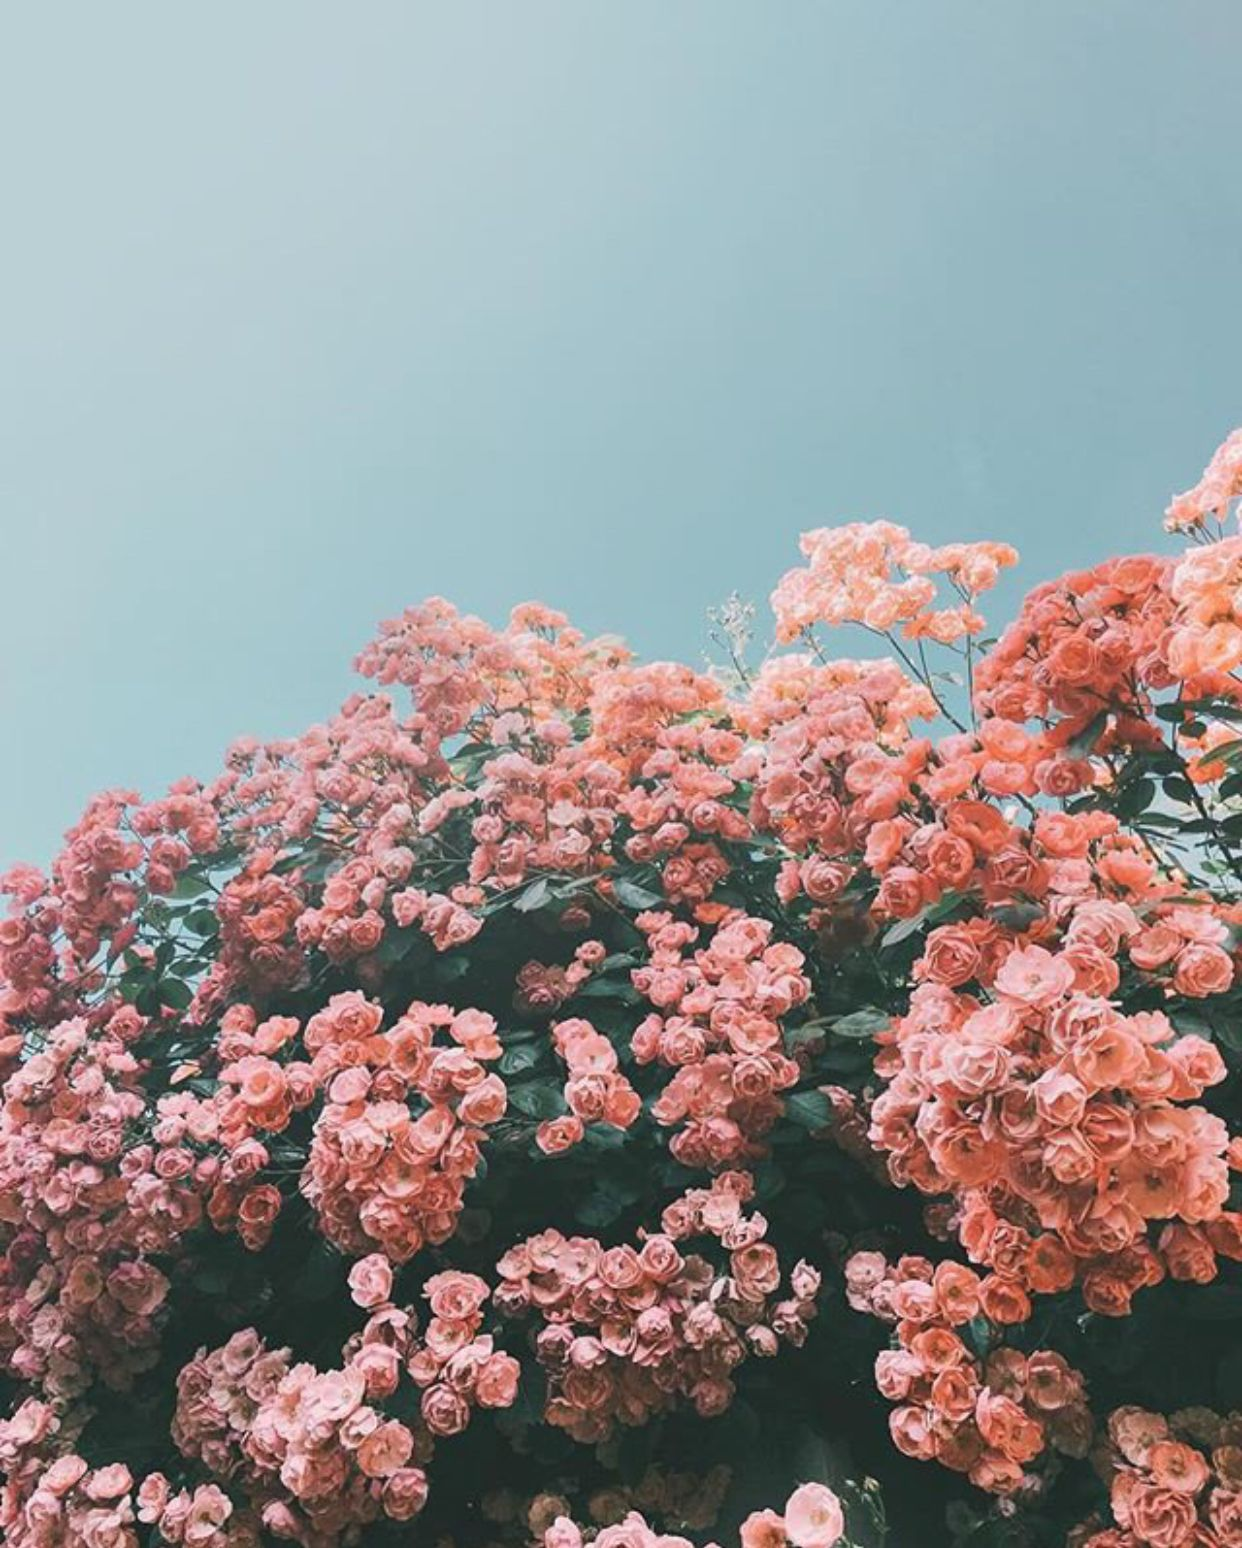 Pin By ᴄᴀʀᴀ On B L O O M Flower Aesthetic Flower